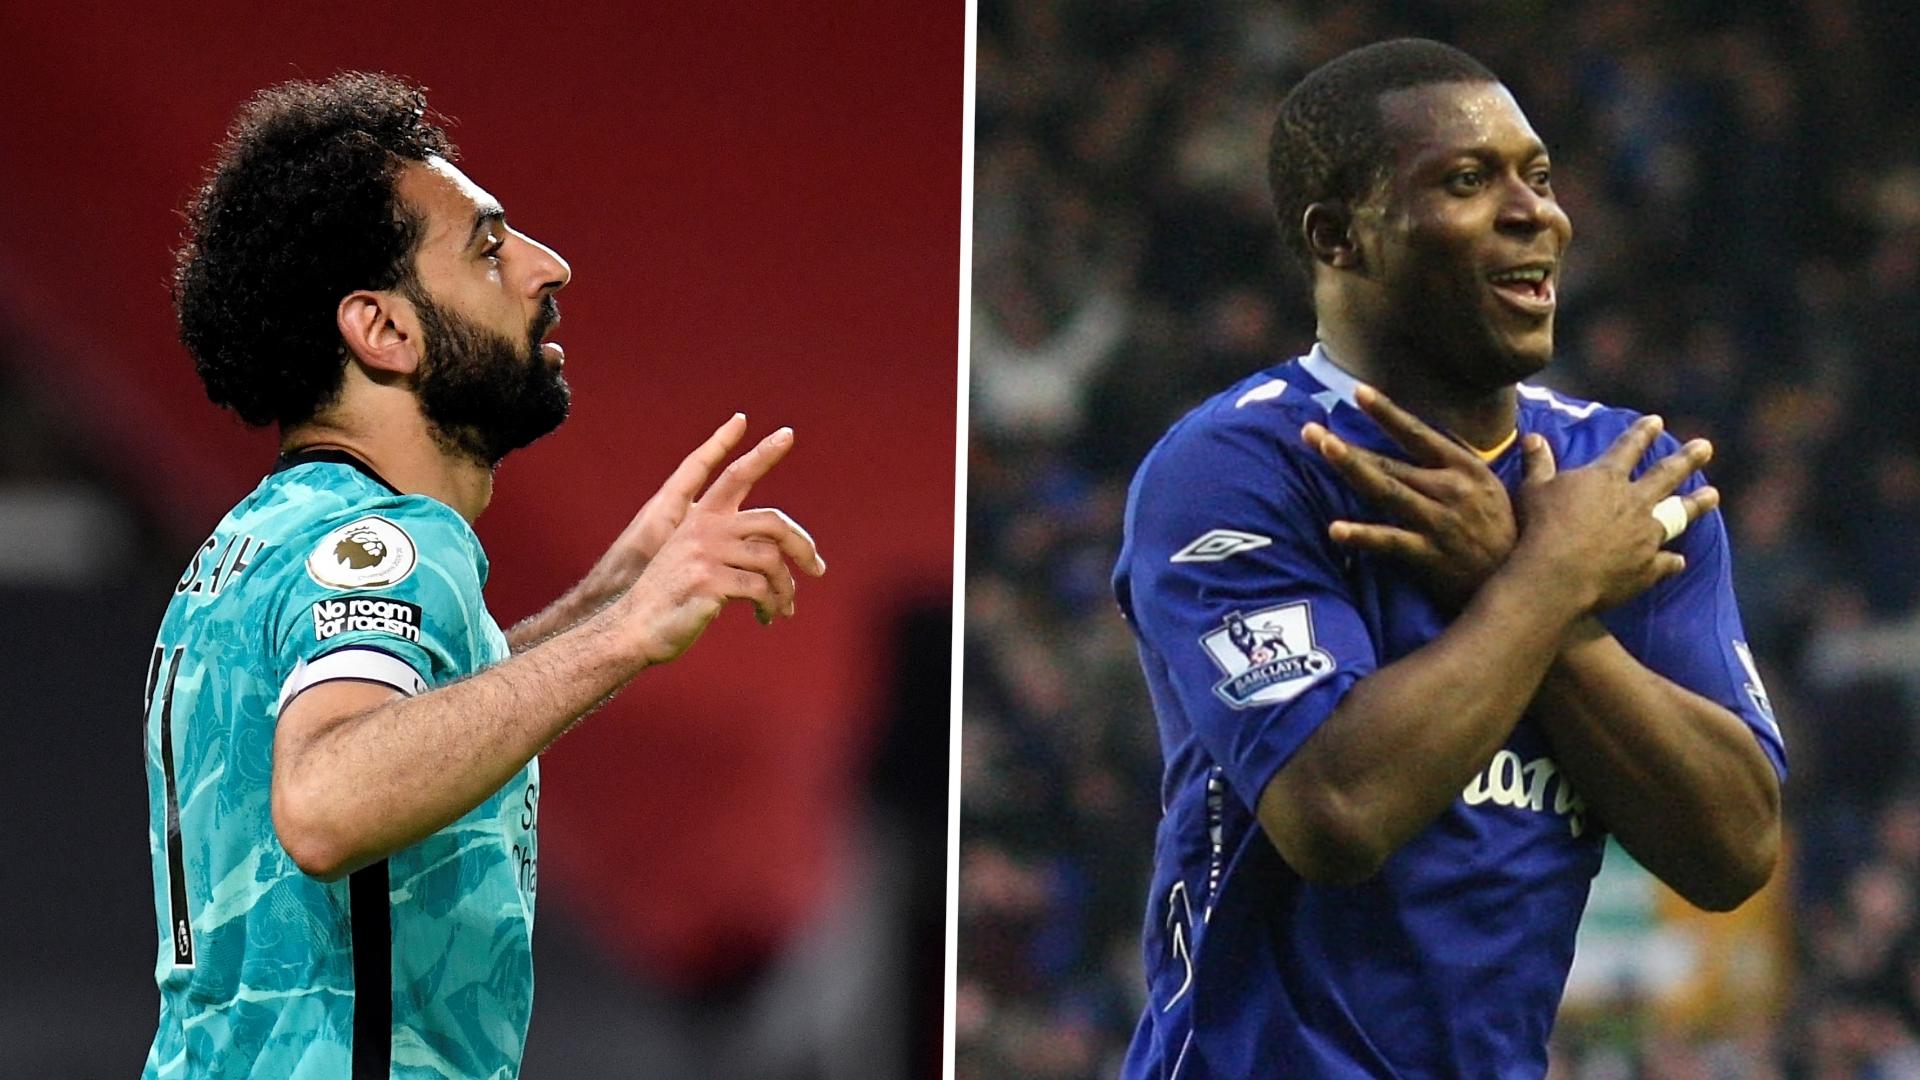 Liverpool star Salah overtakes Nigeria legend Yakubu in Premier League goalscoring chart